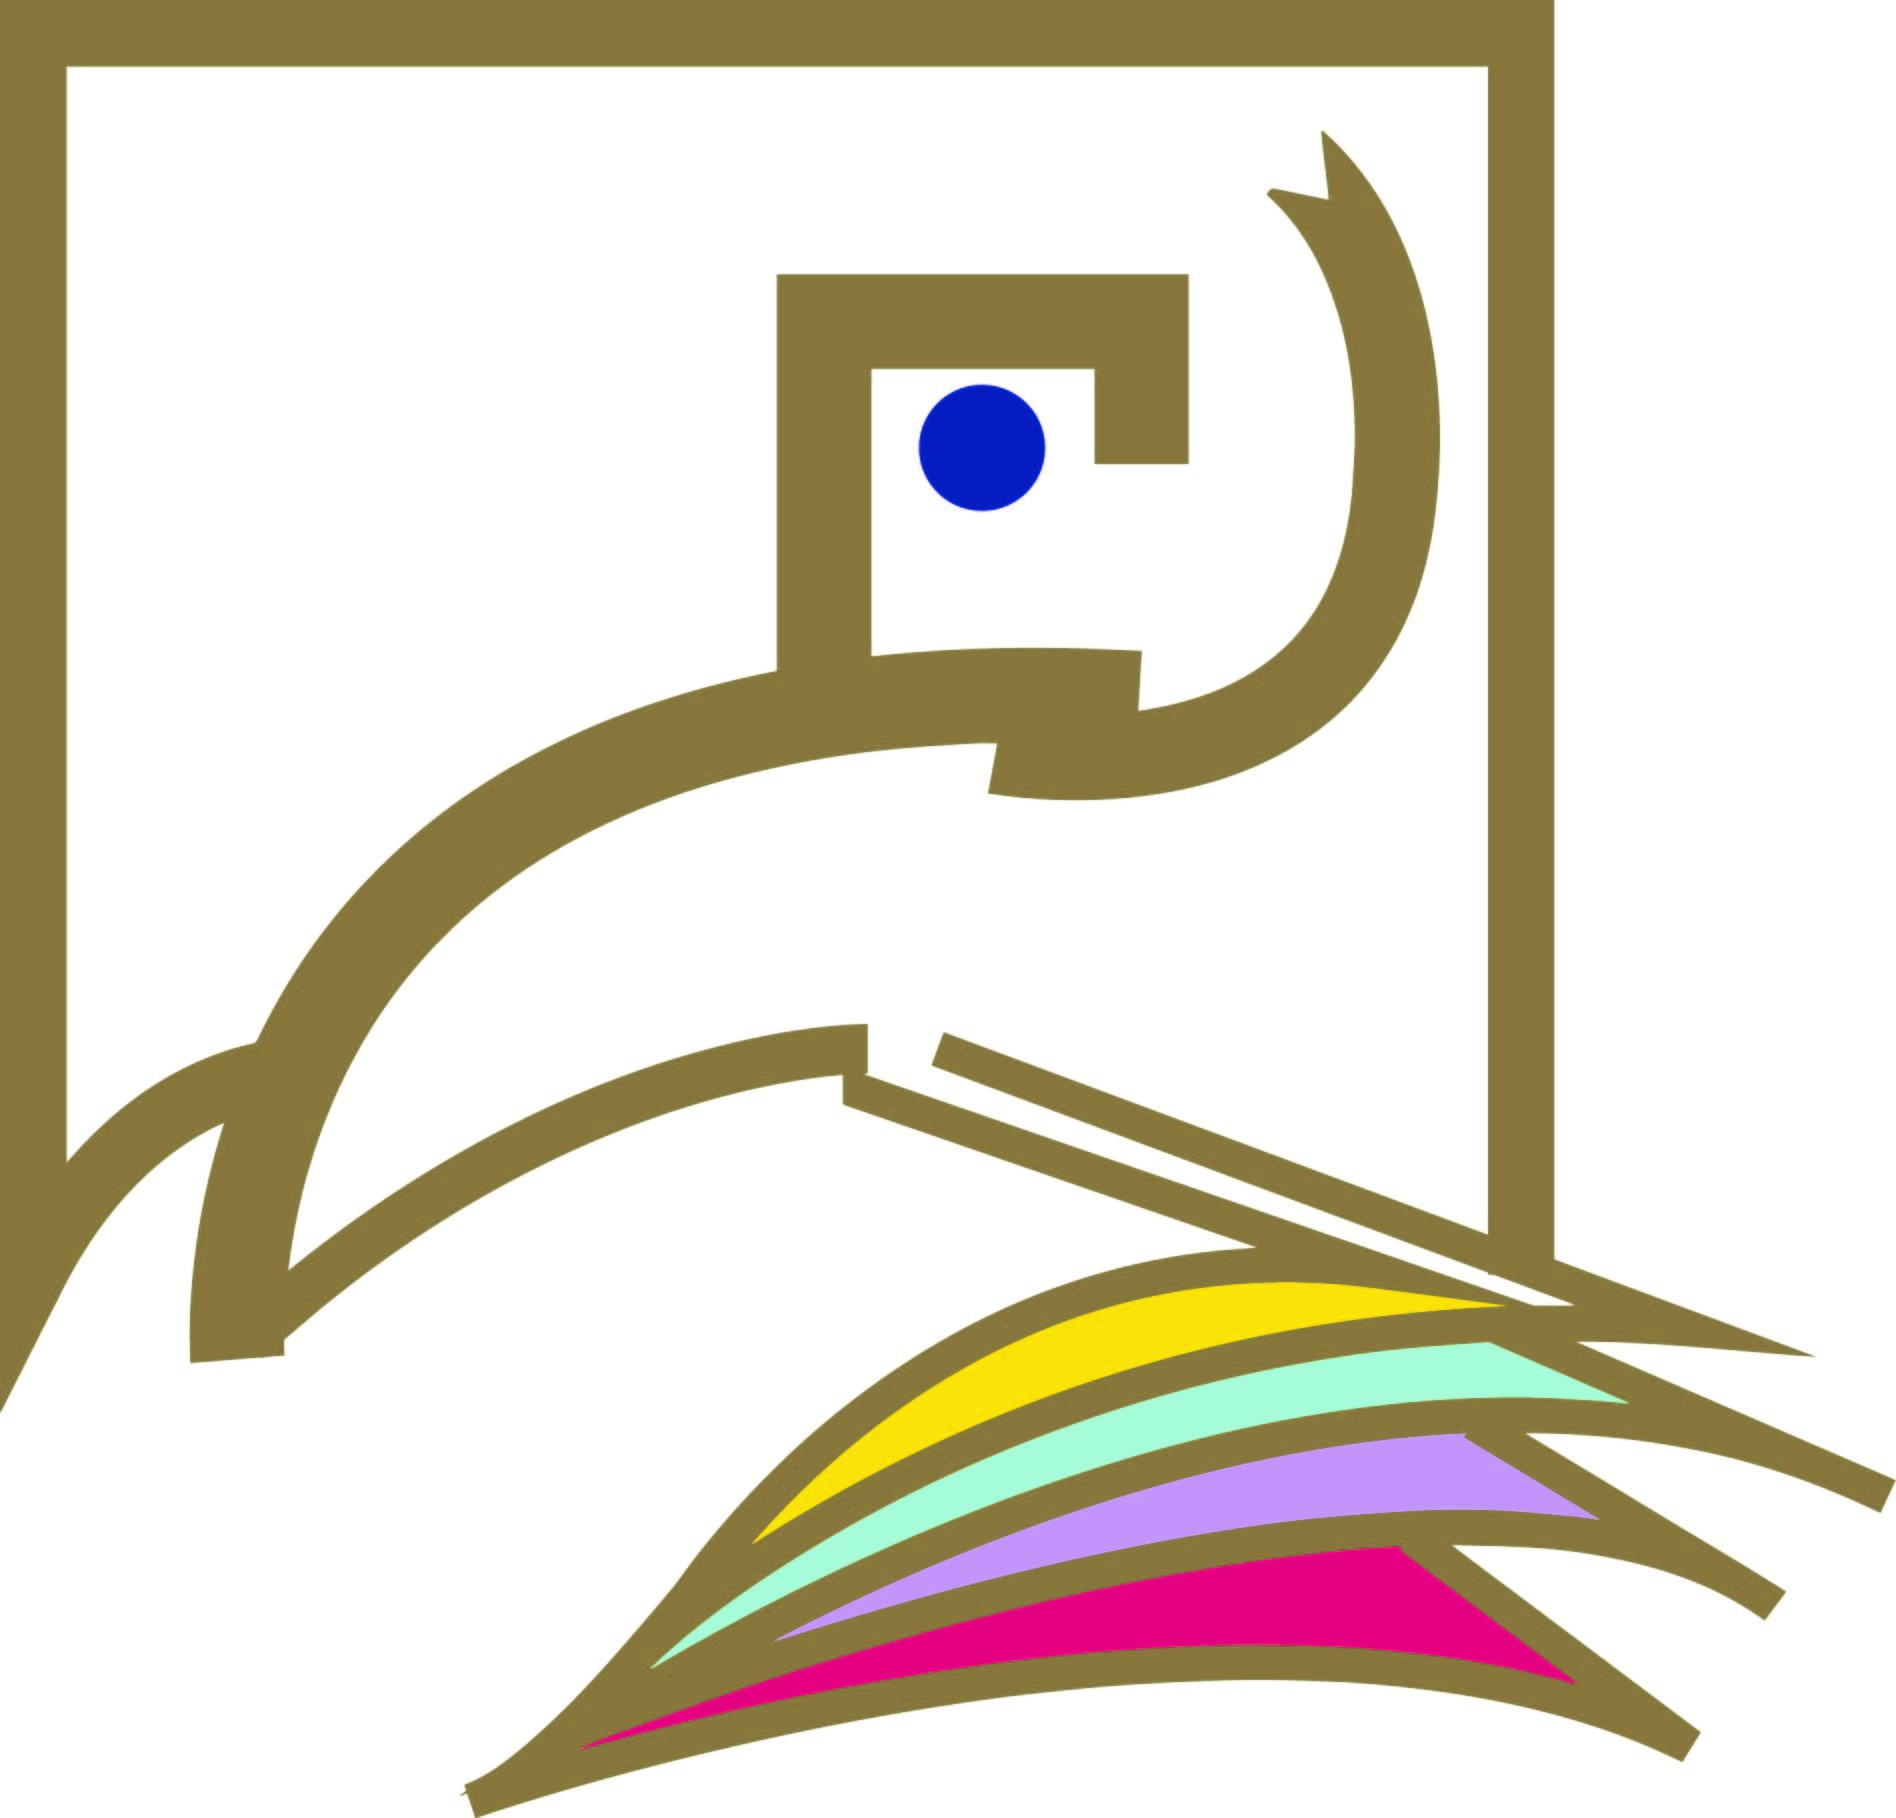 Our new logo, made by professional designer, Jon Oddvar Myrkaskog, as a donation for Children of Zululand